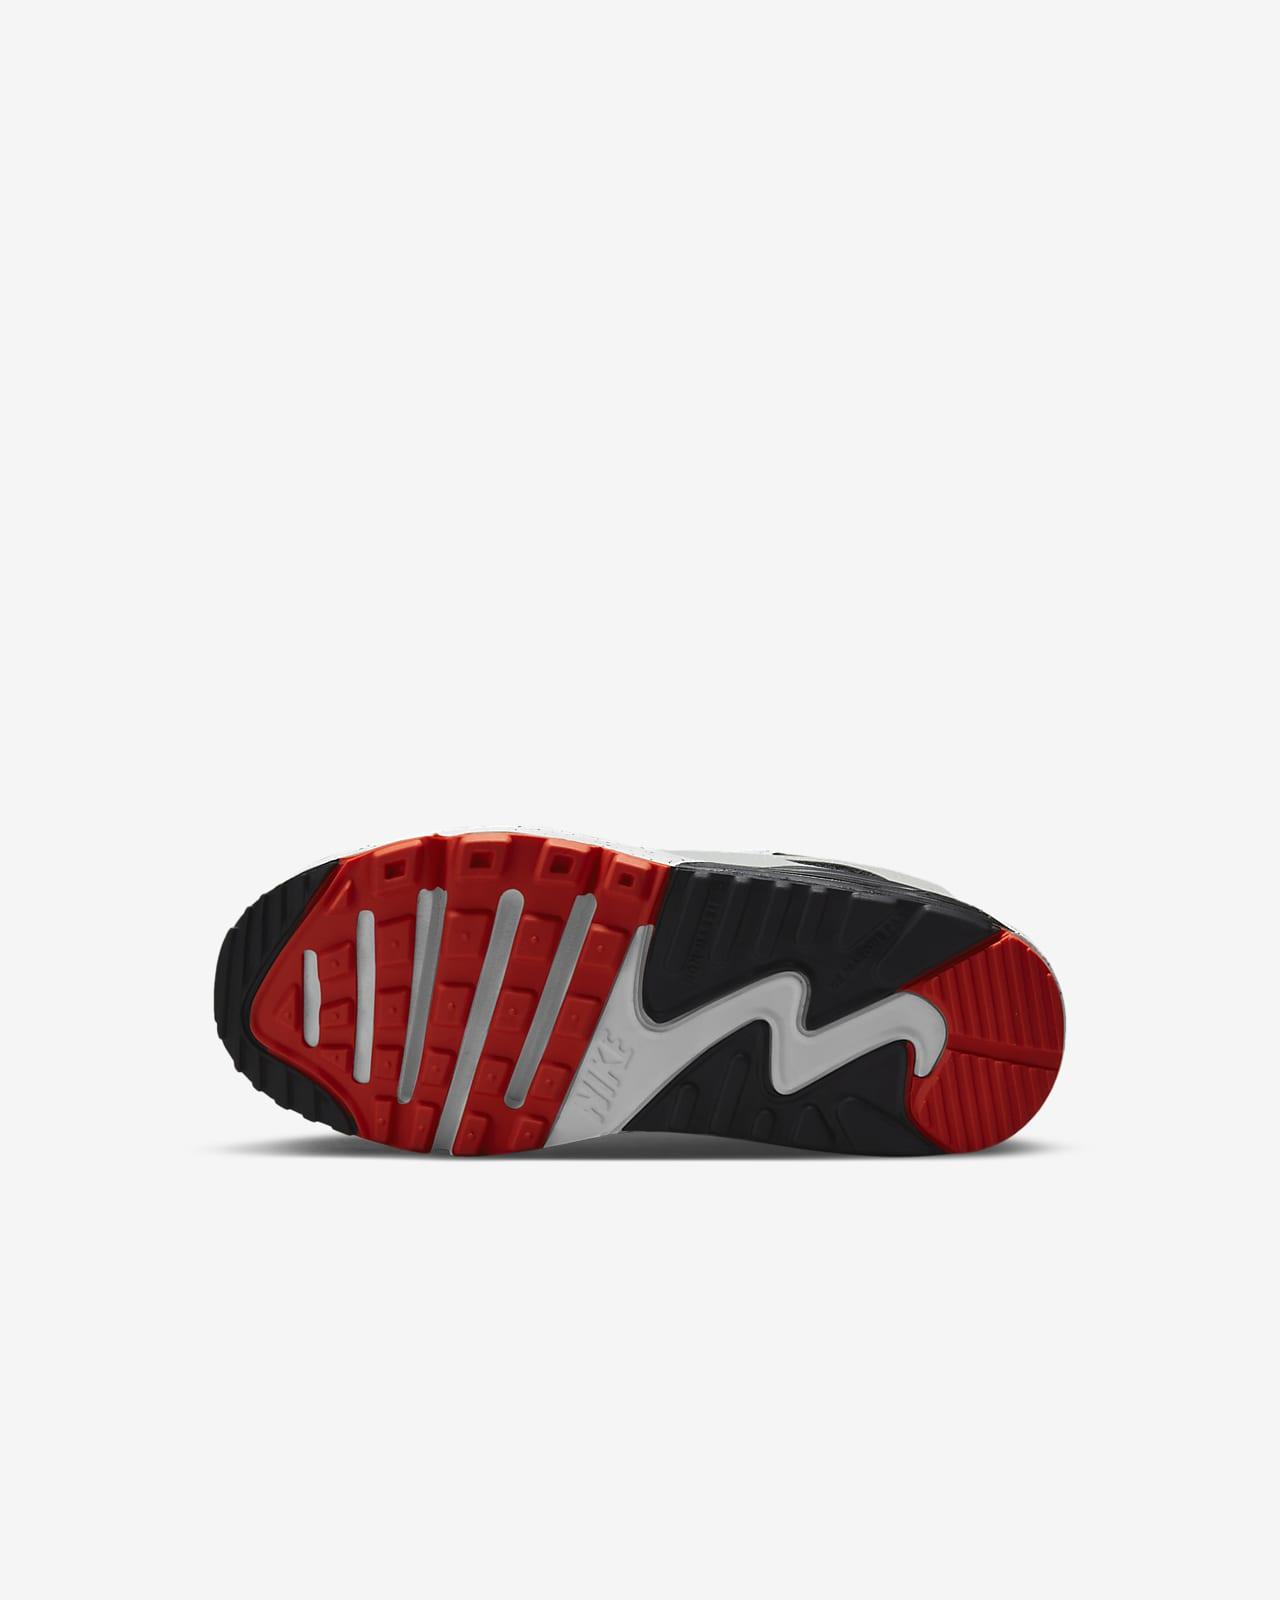 Nike Air Max 90 Little Kids' Shoes